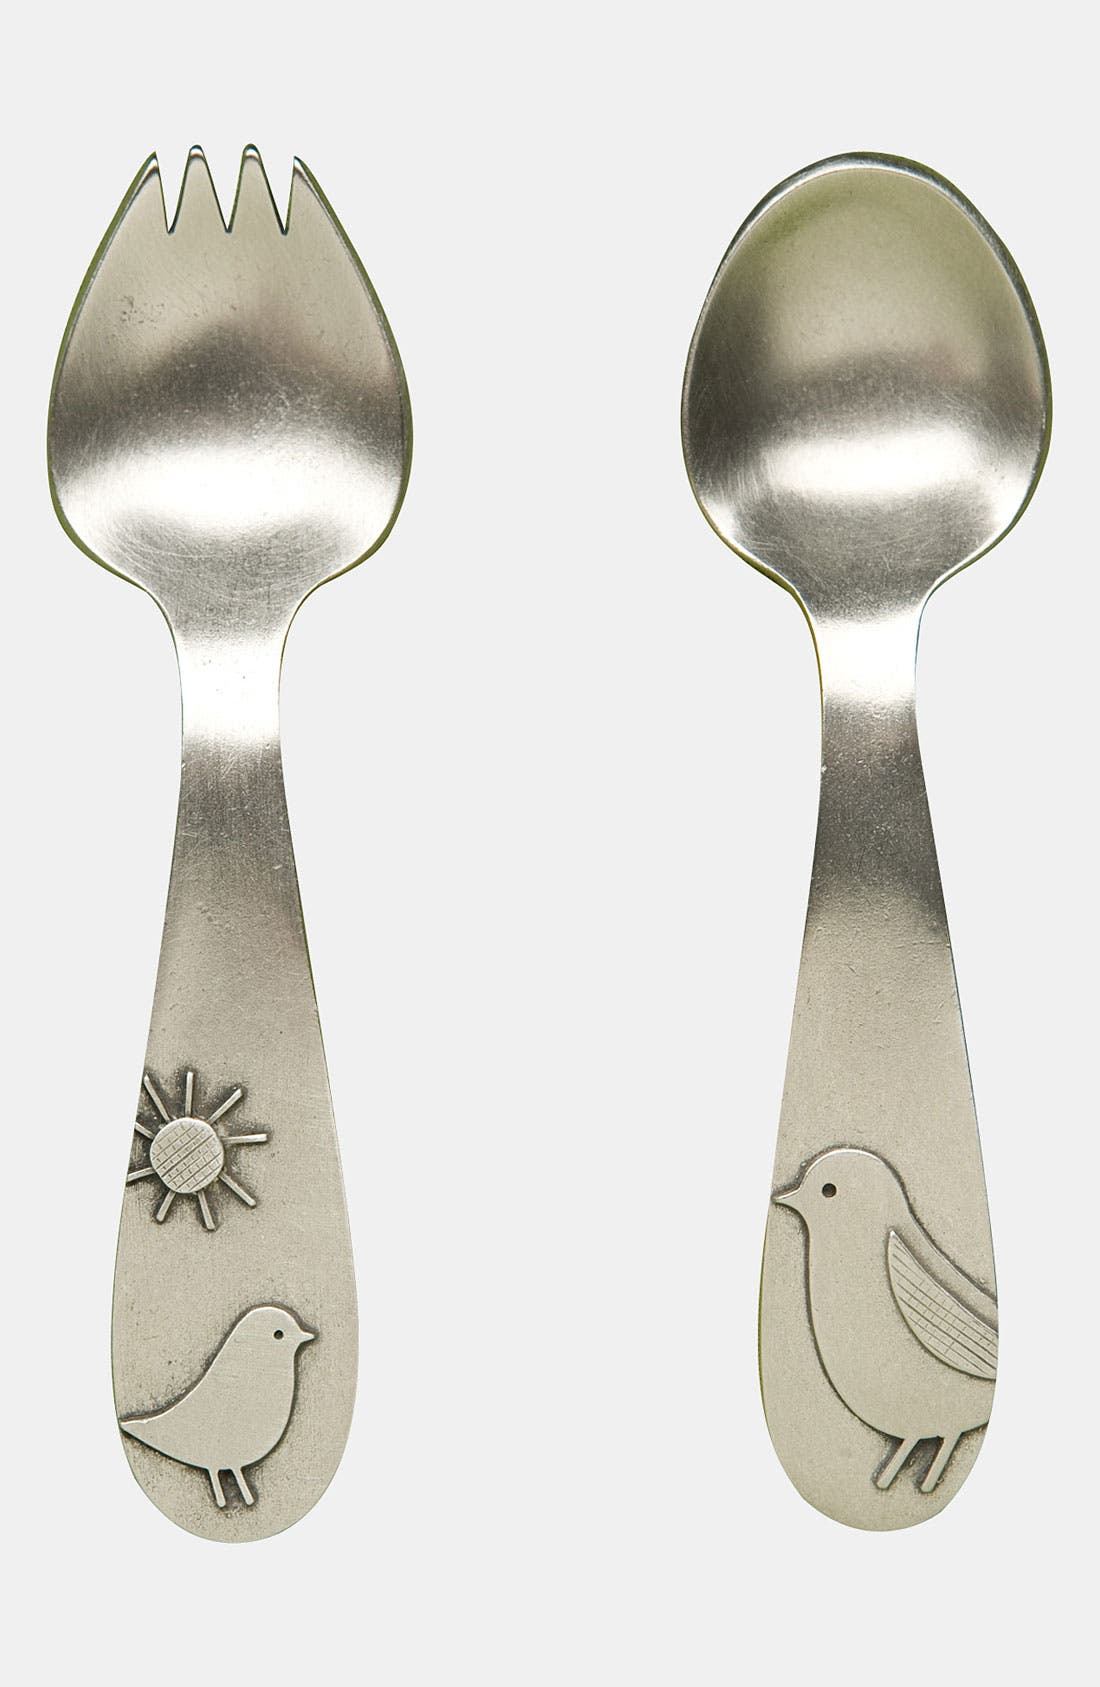 Alternate Image 1 Selected - Beehive Kitchenware 'Momma & Baby Bird' Keepsake Spoon & Fork